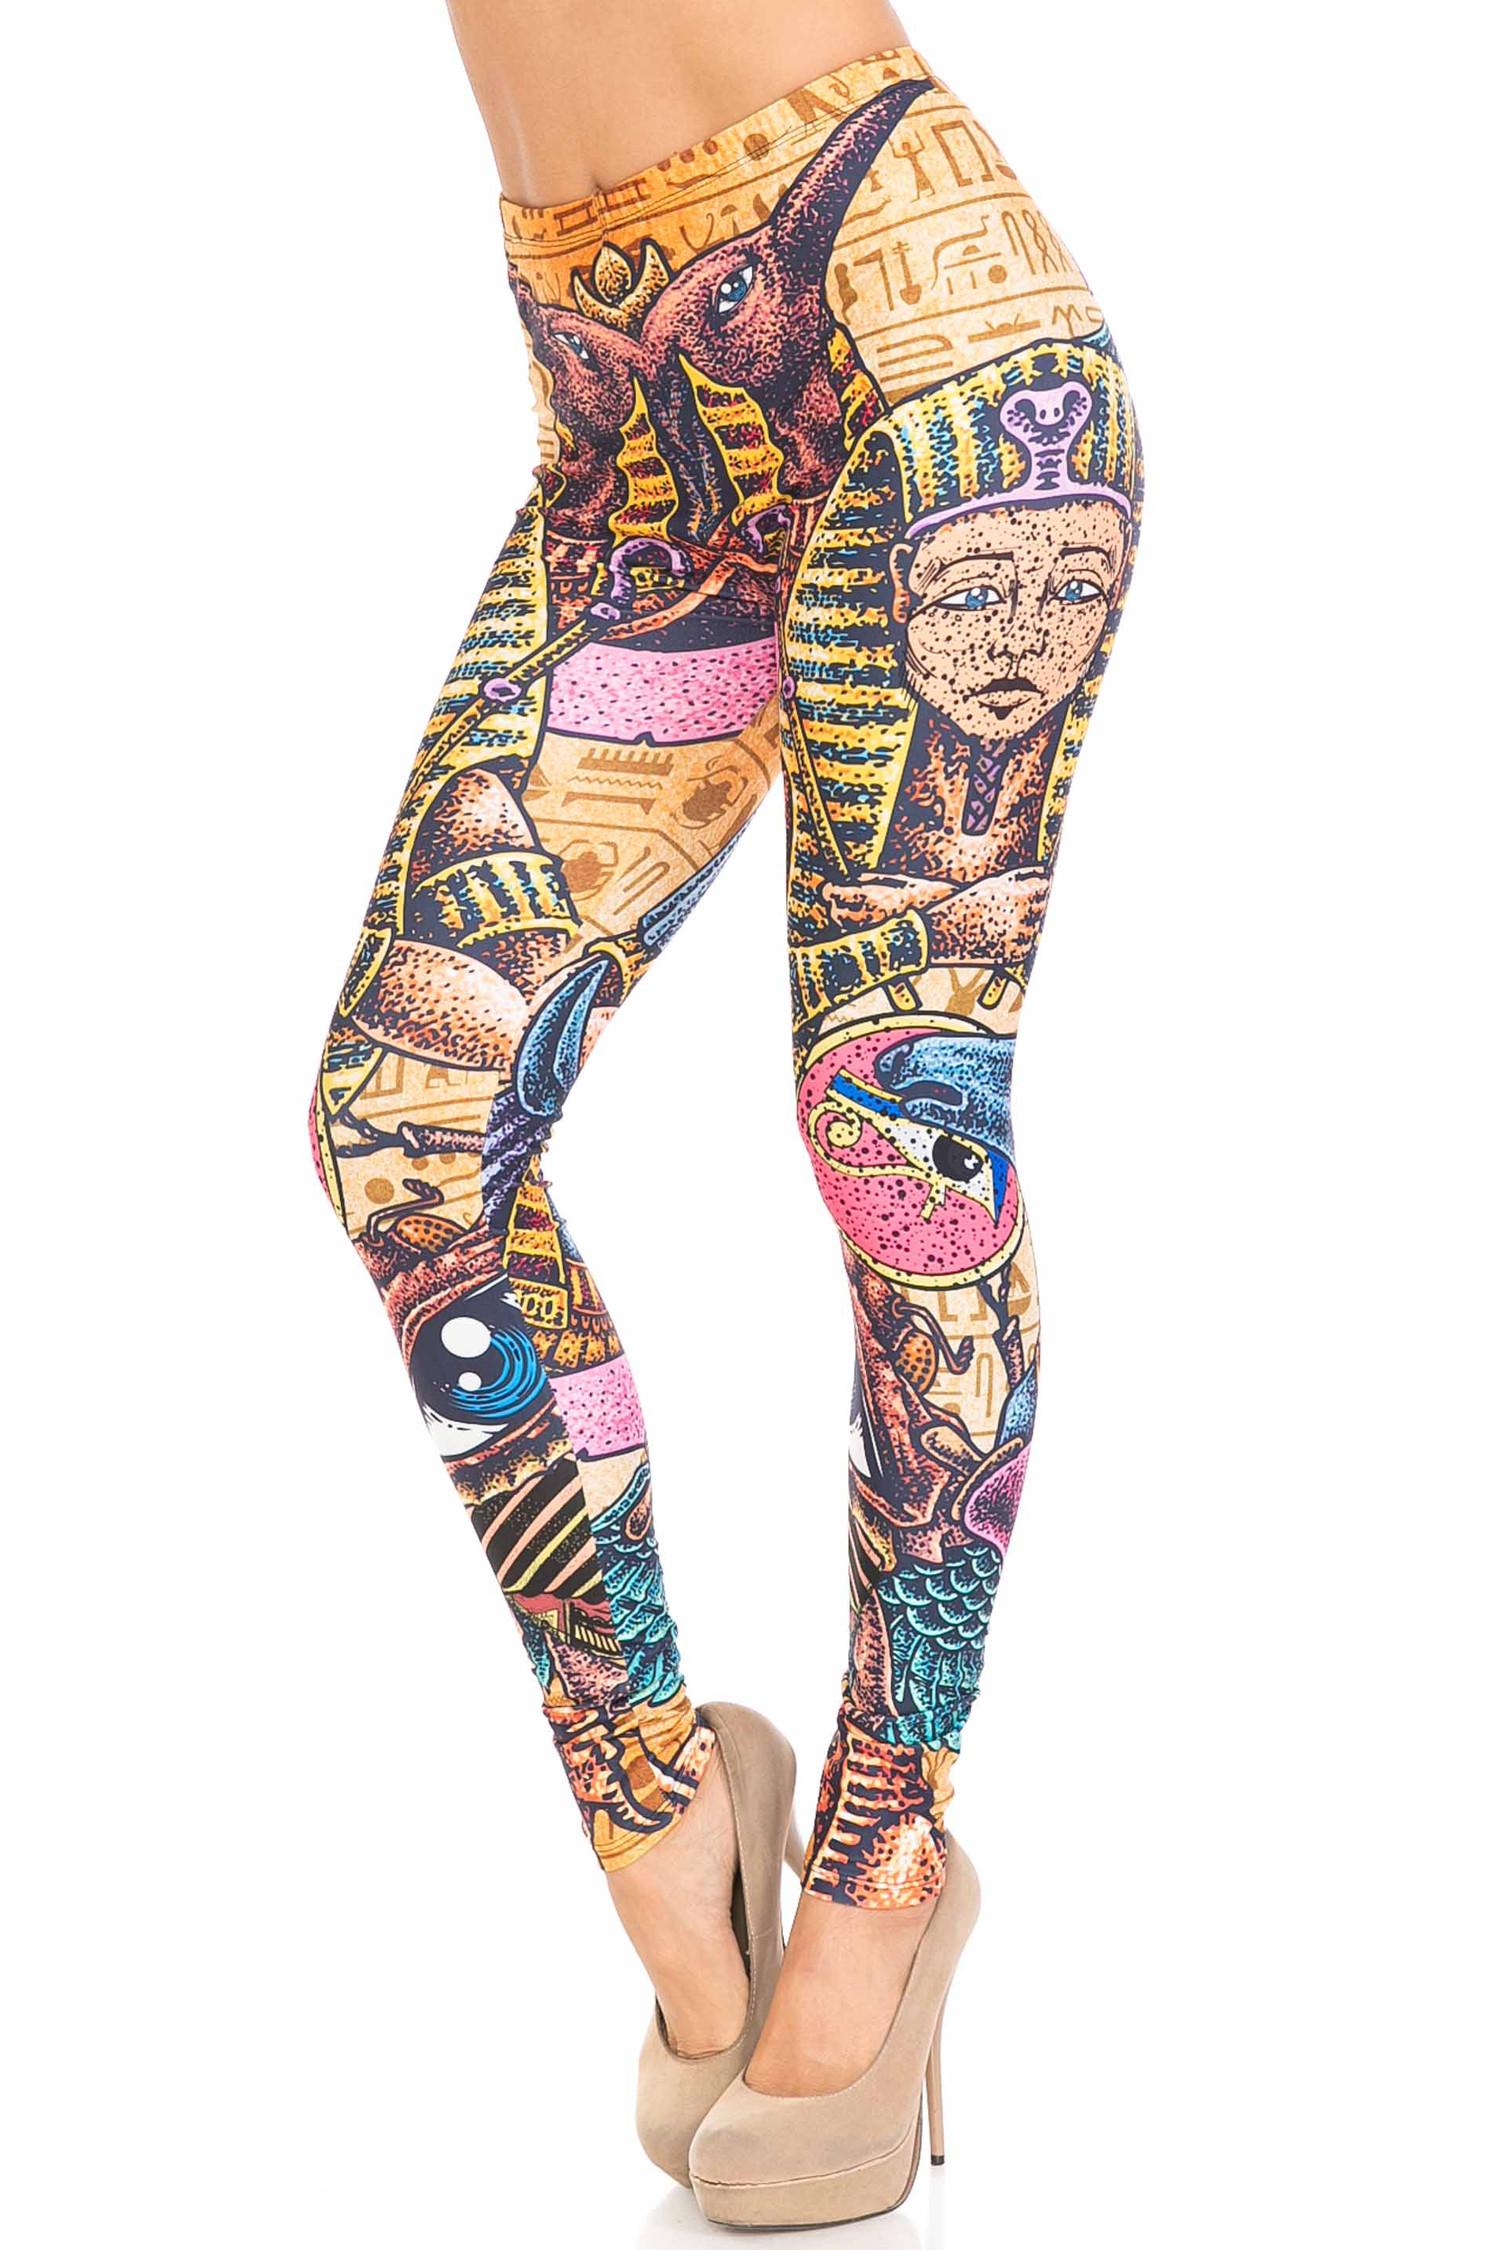 Creamy Soft Gods of Egypt Leggings - USA Fashion™